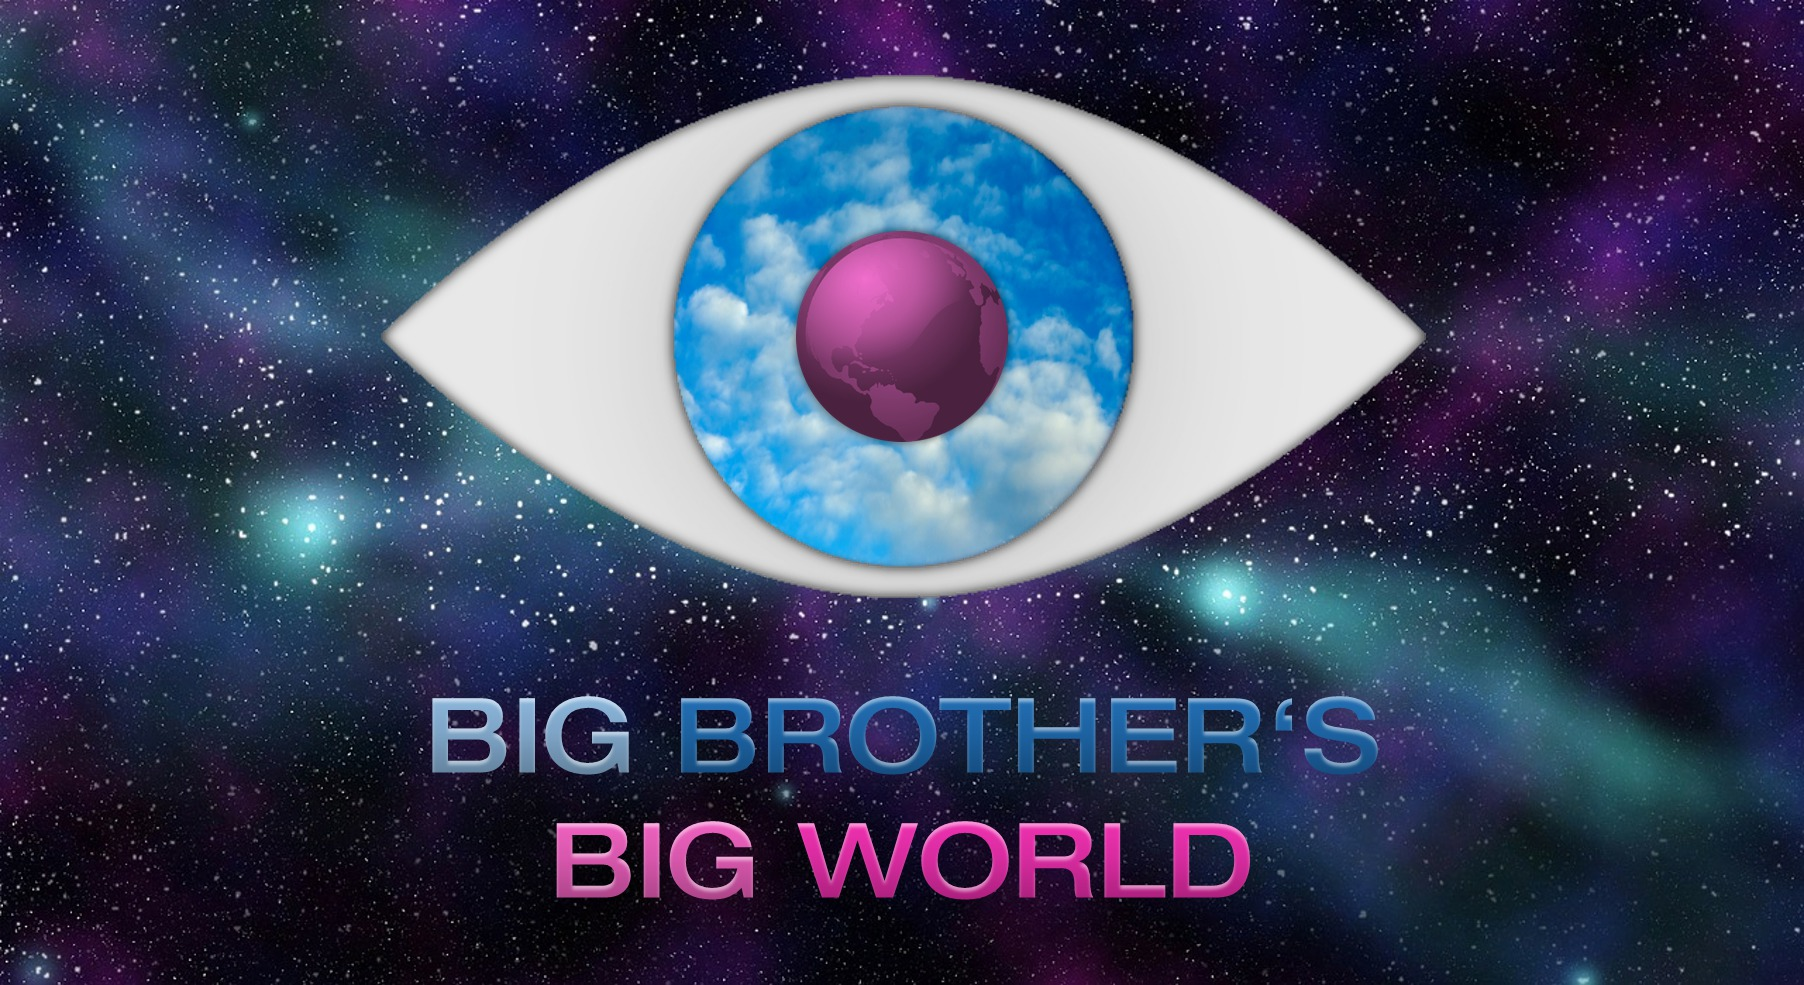 Big Brother's Big World